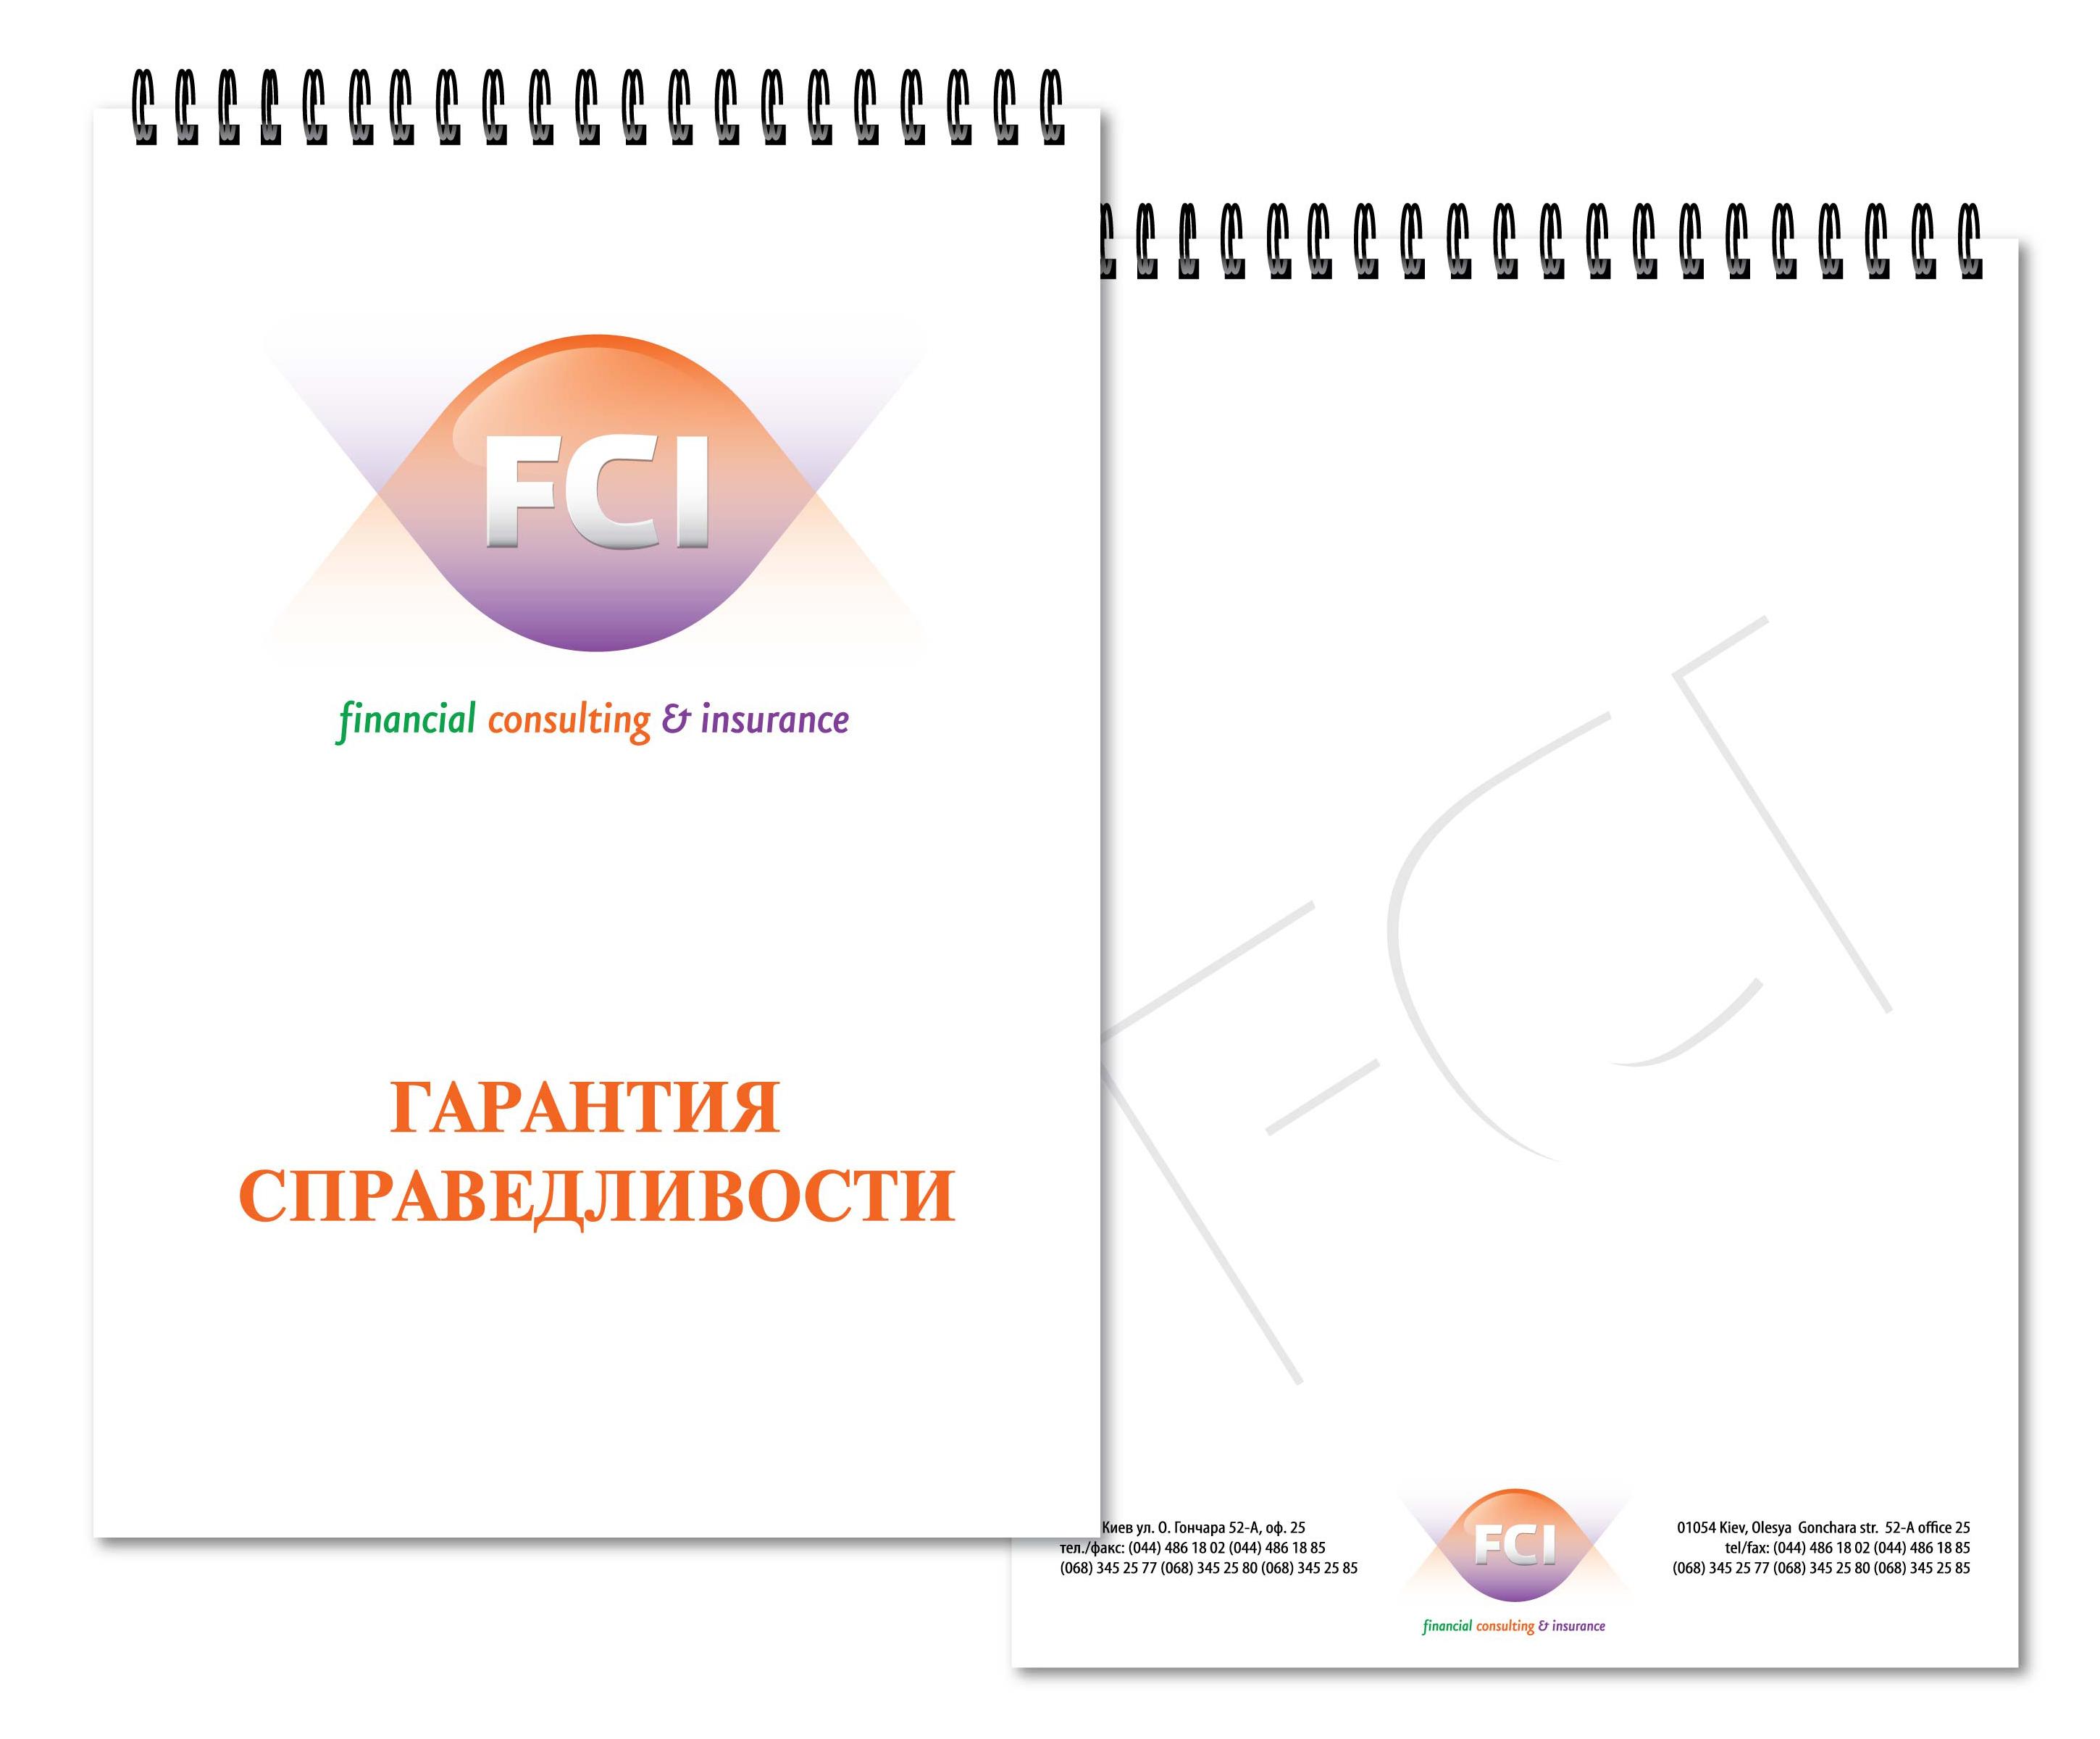 http://bvi.kiev.ua/wp-content/uploads/2015/05/31.jpg